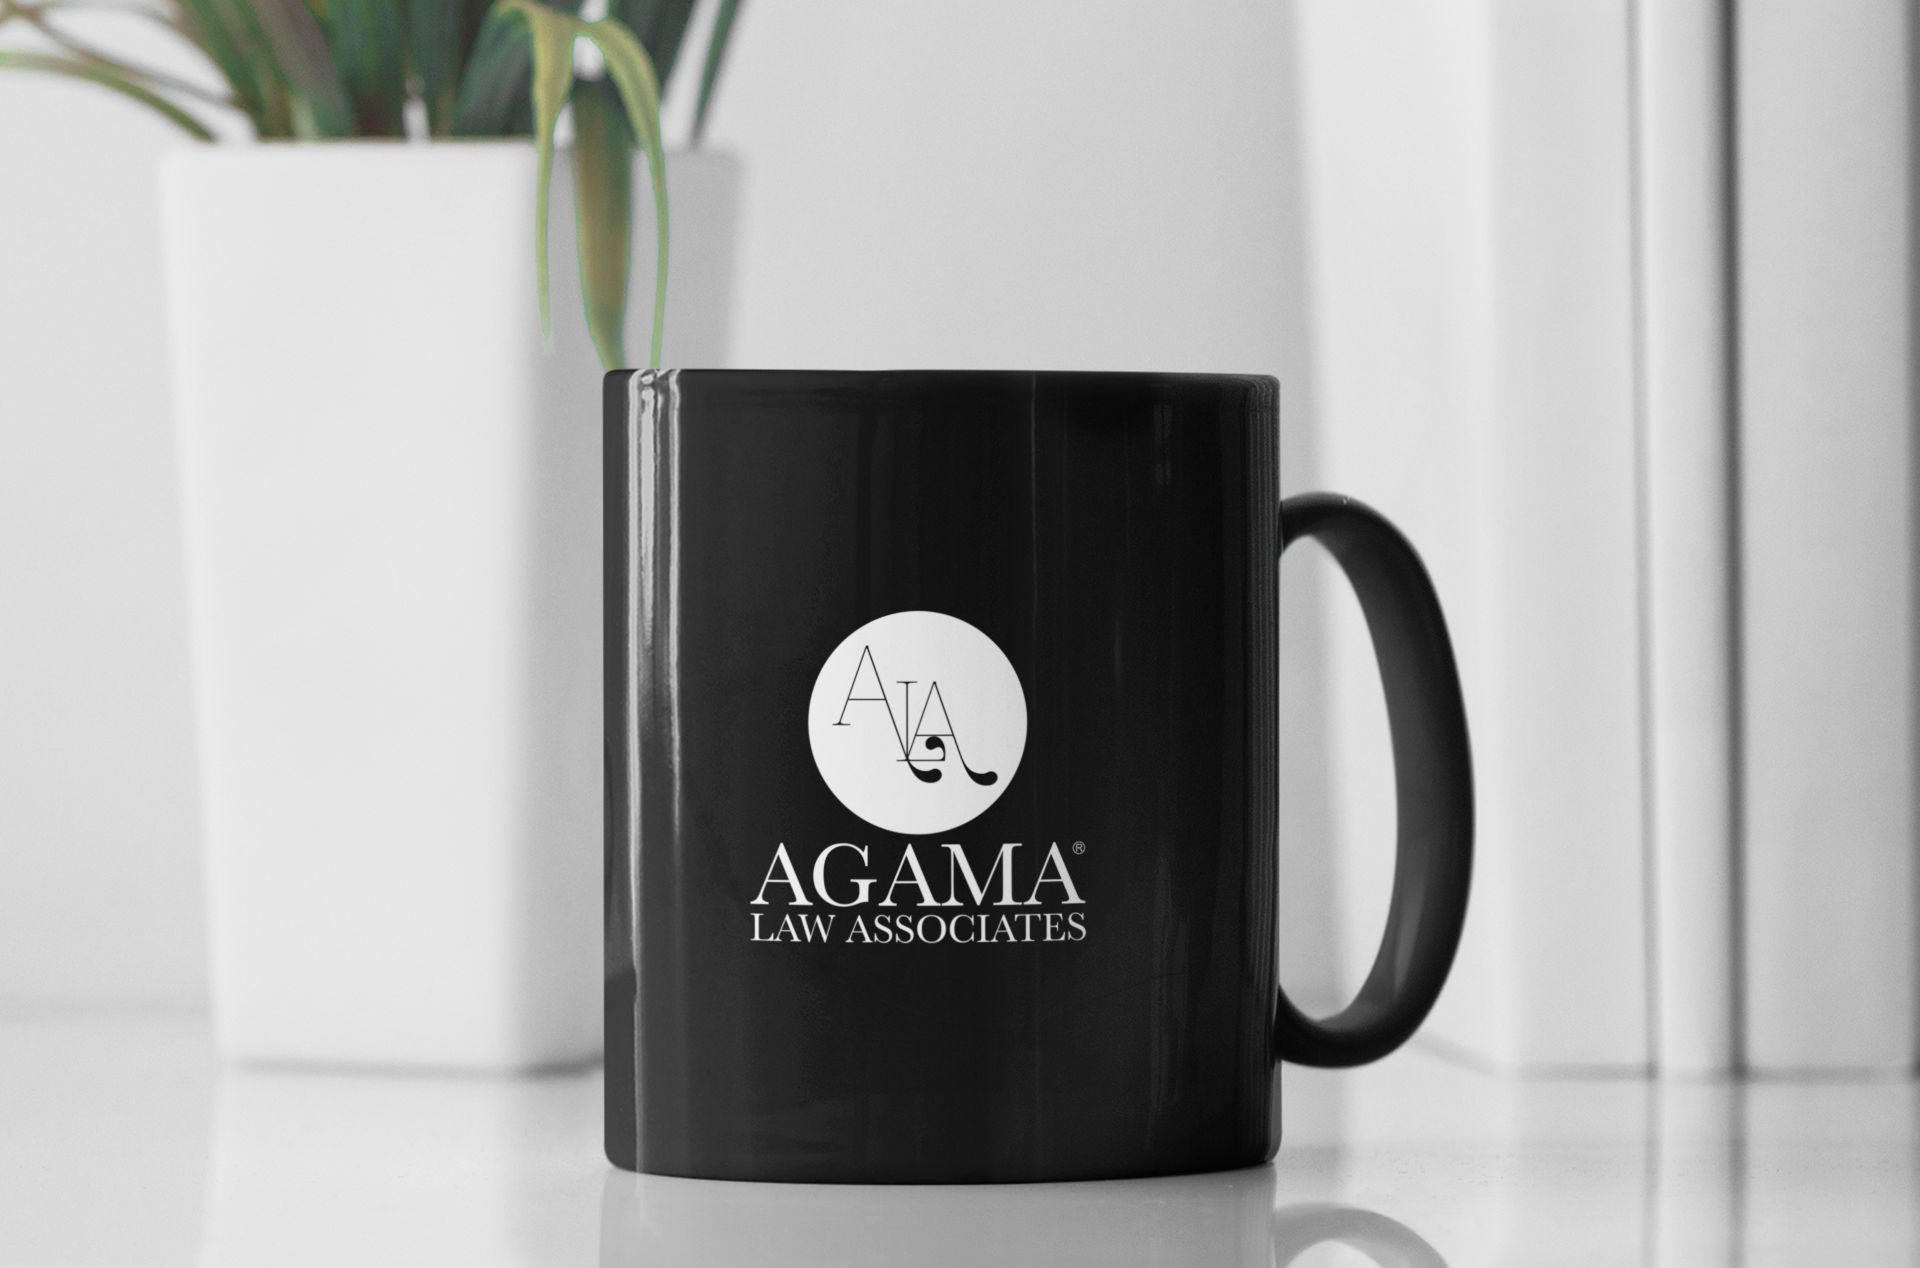 Agama Law Associates - Mug